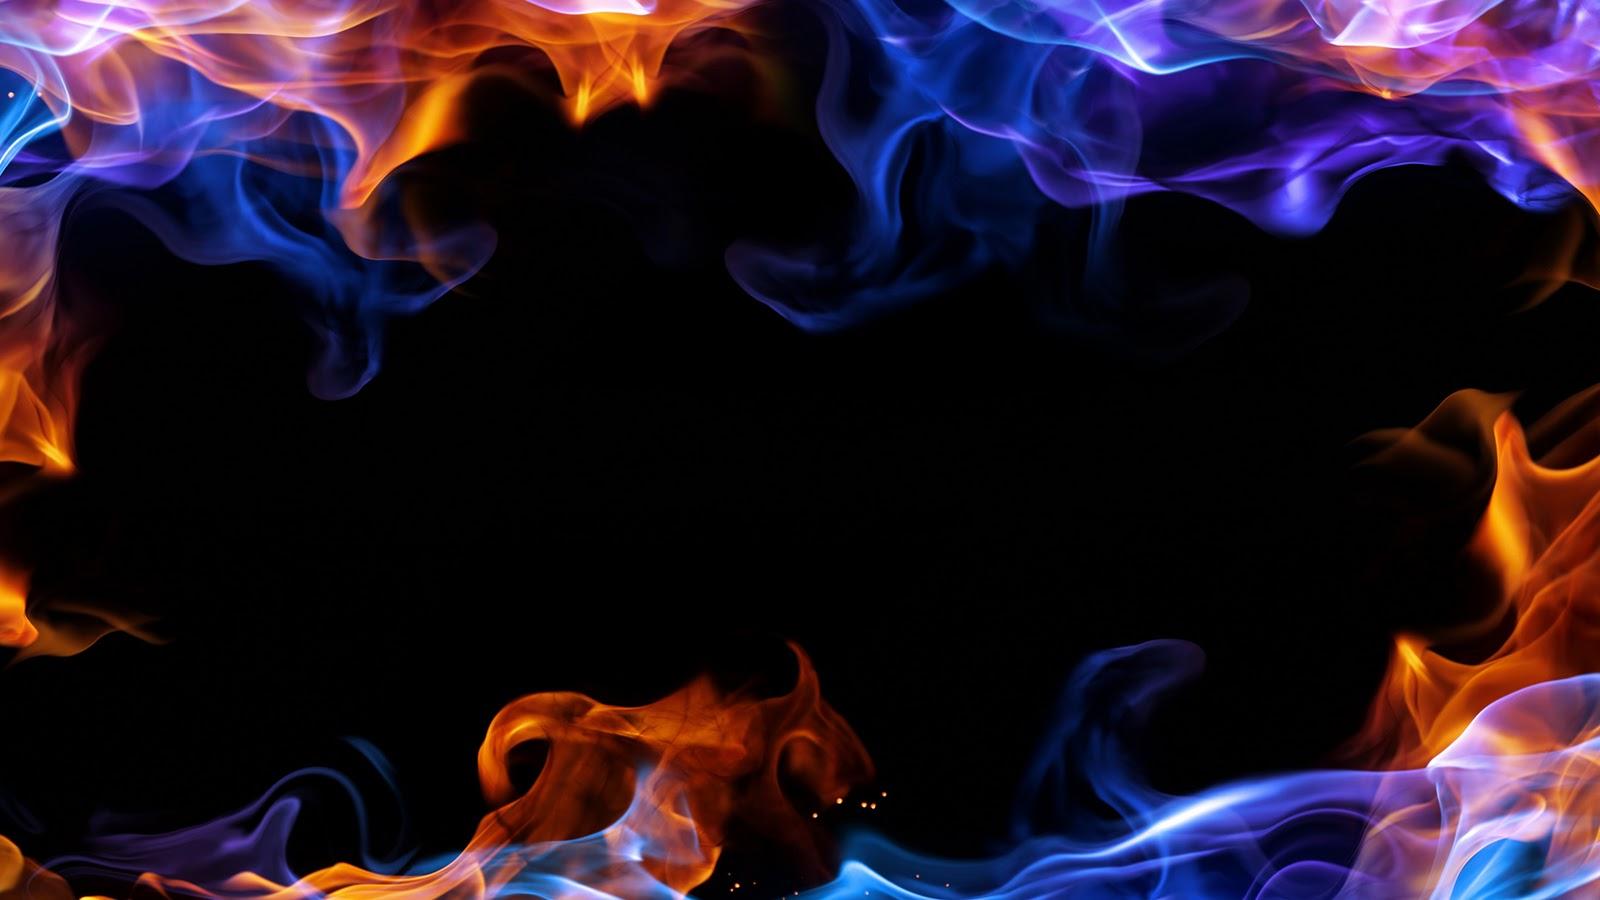 Blue Fire Border Flames